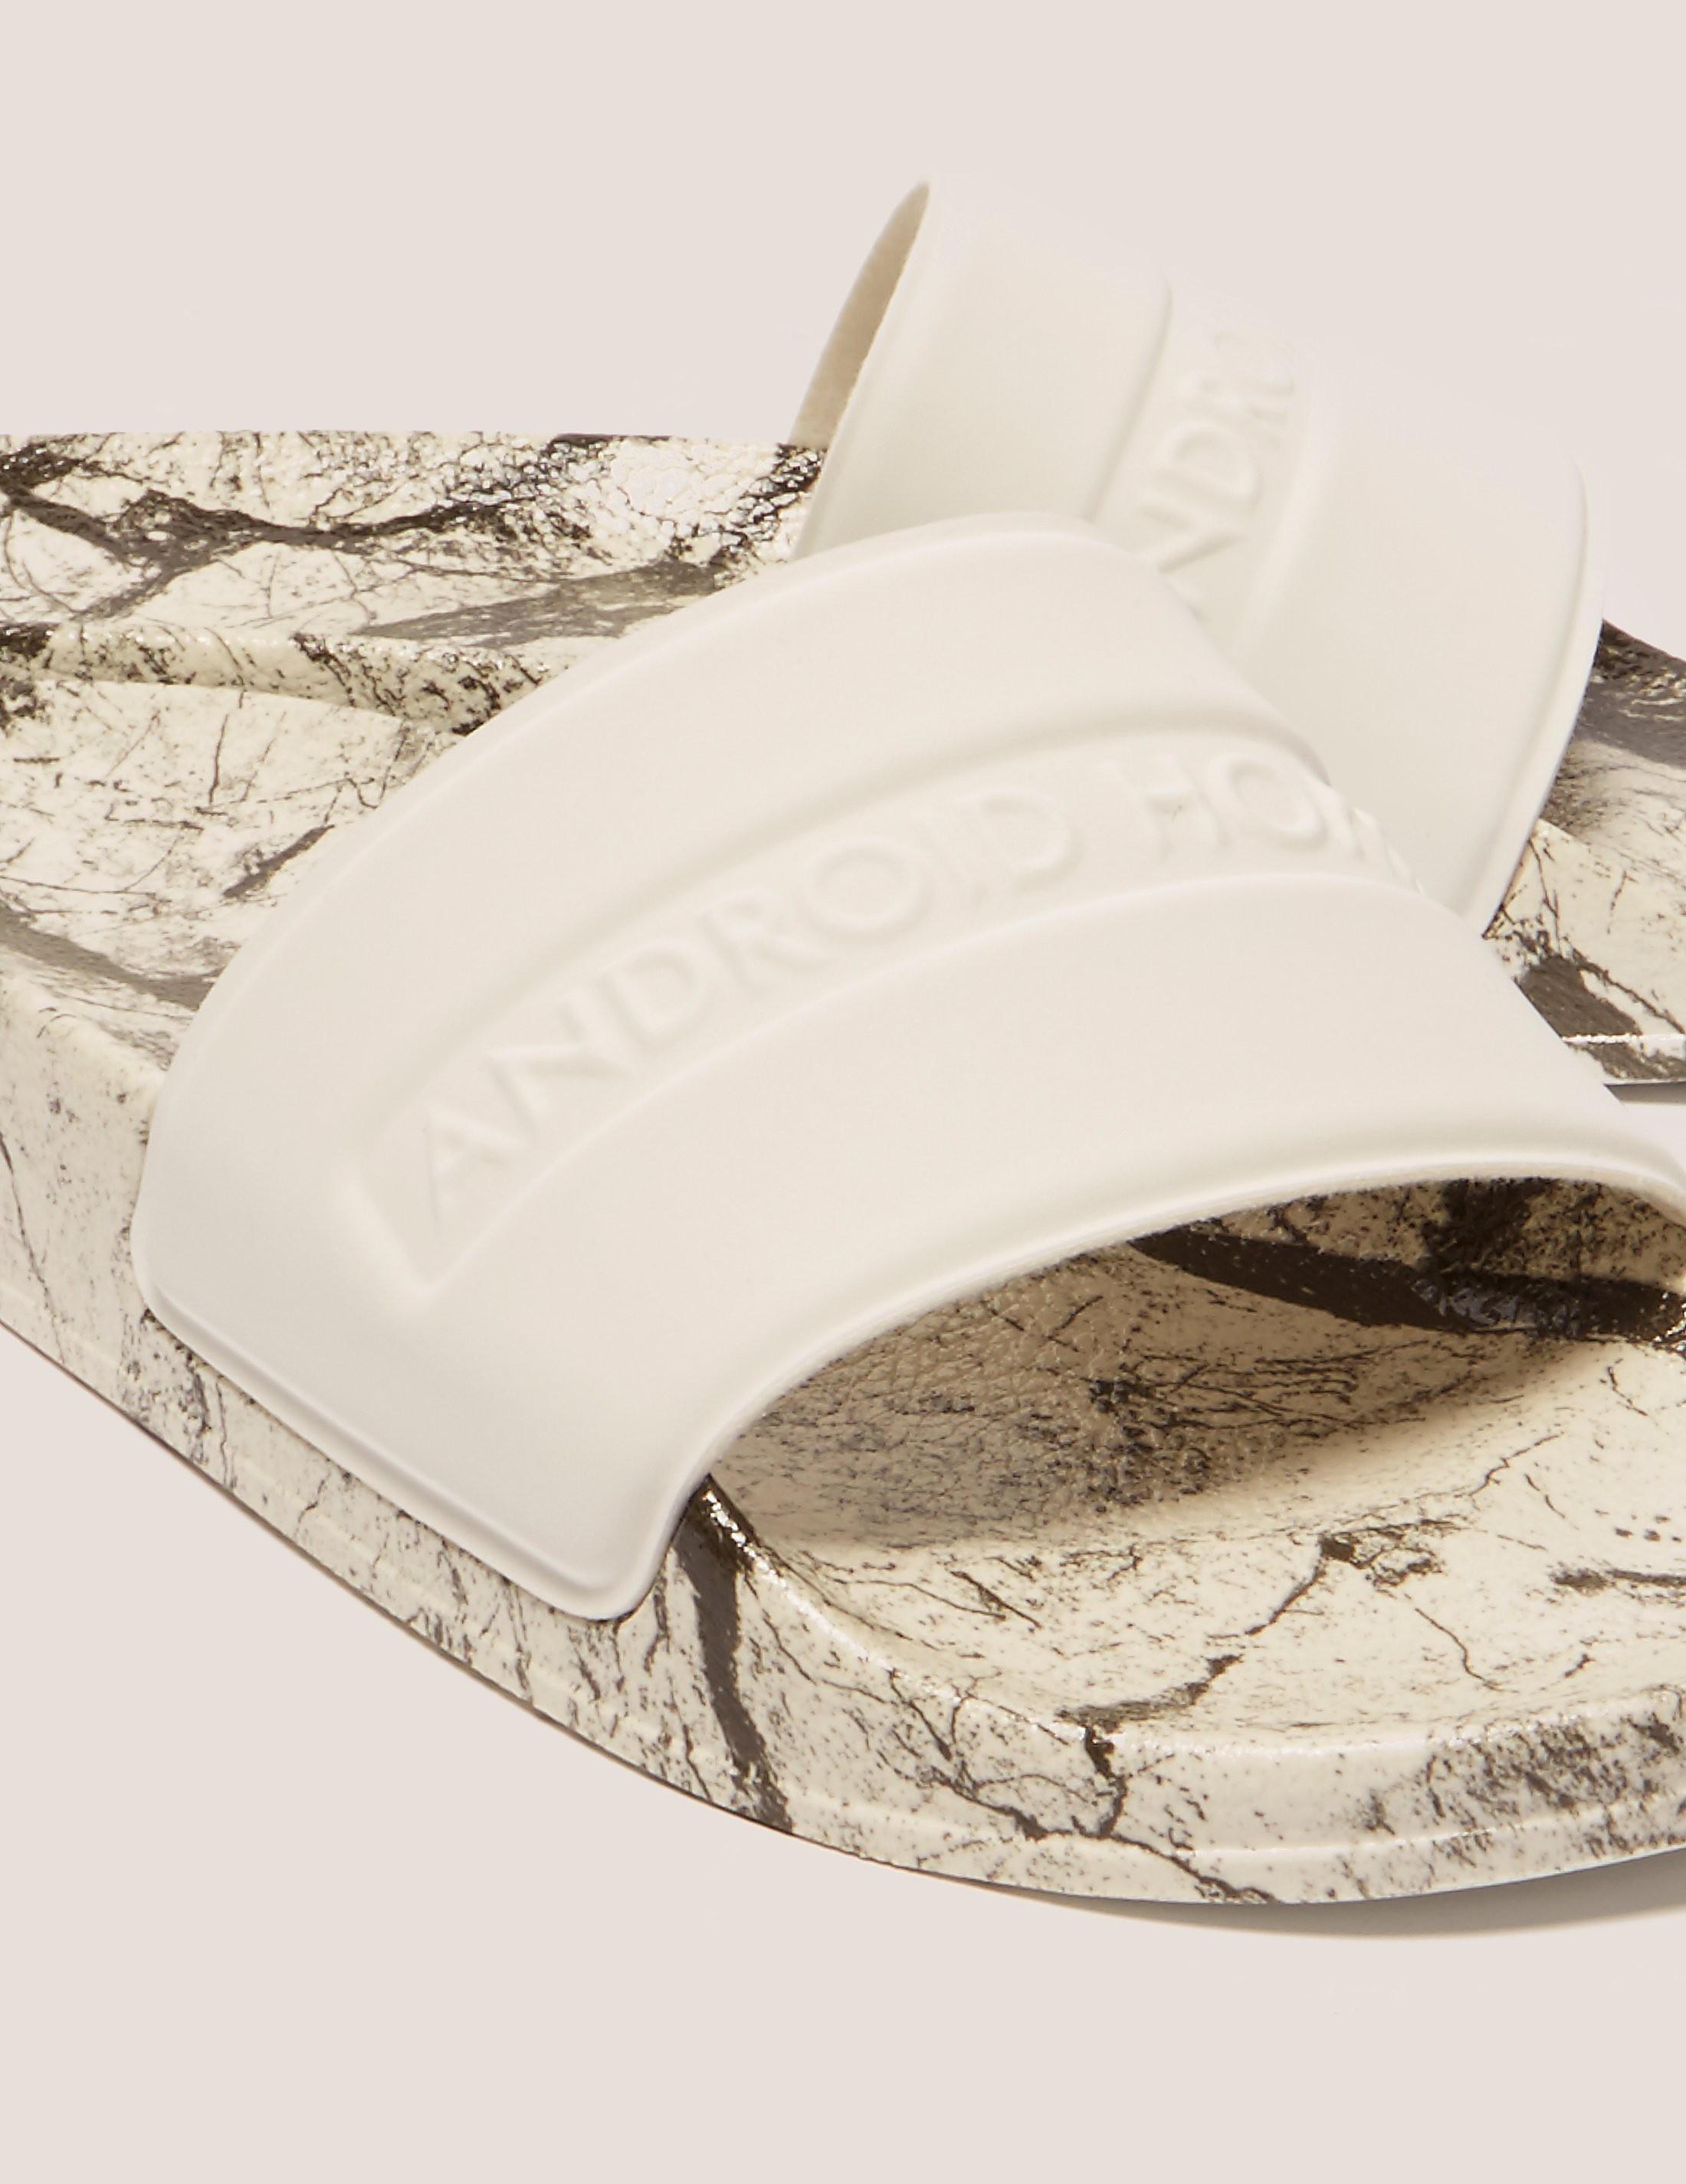 Android Homme Slide Sandals